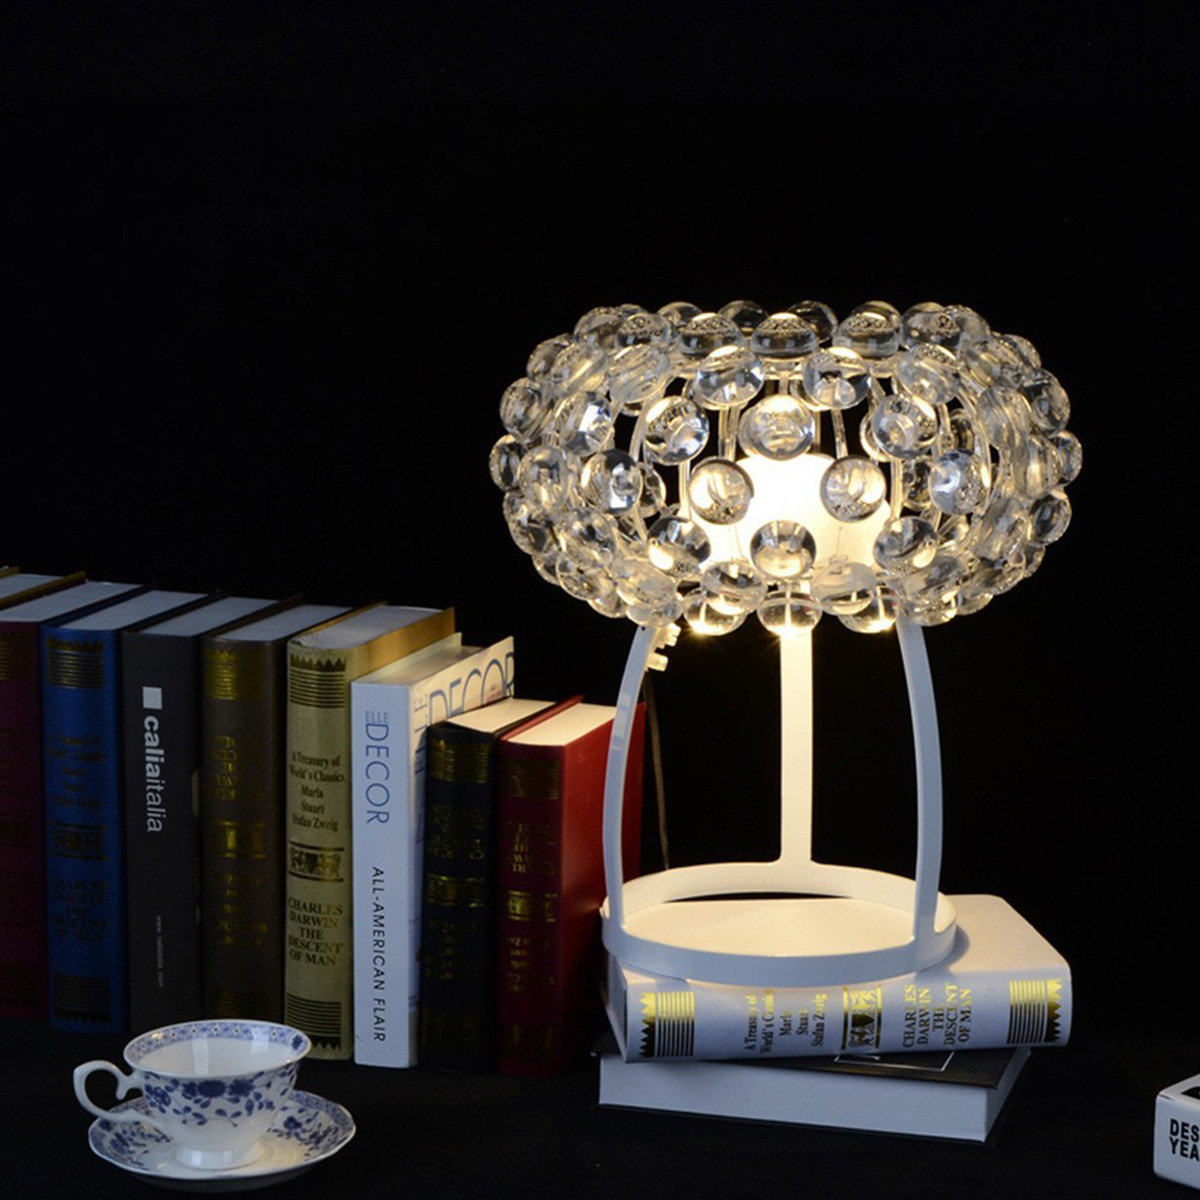 Stona lampa Caboche plus LED 311021-16 transparentna